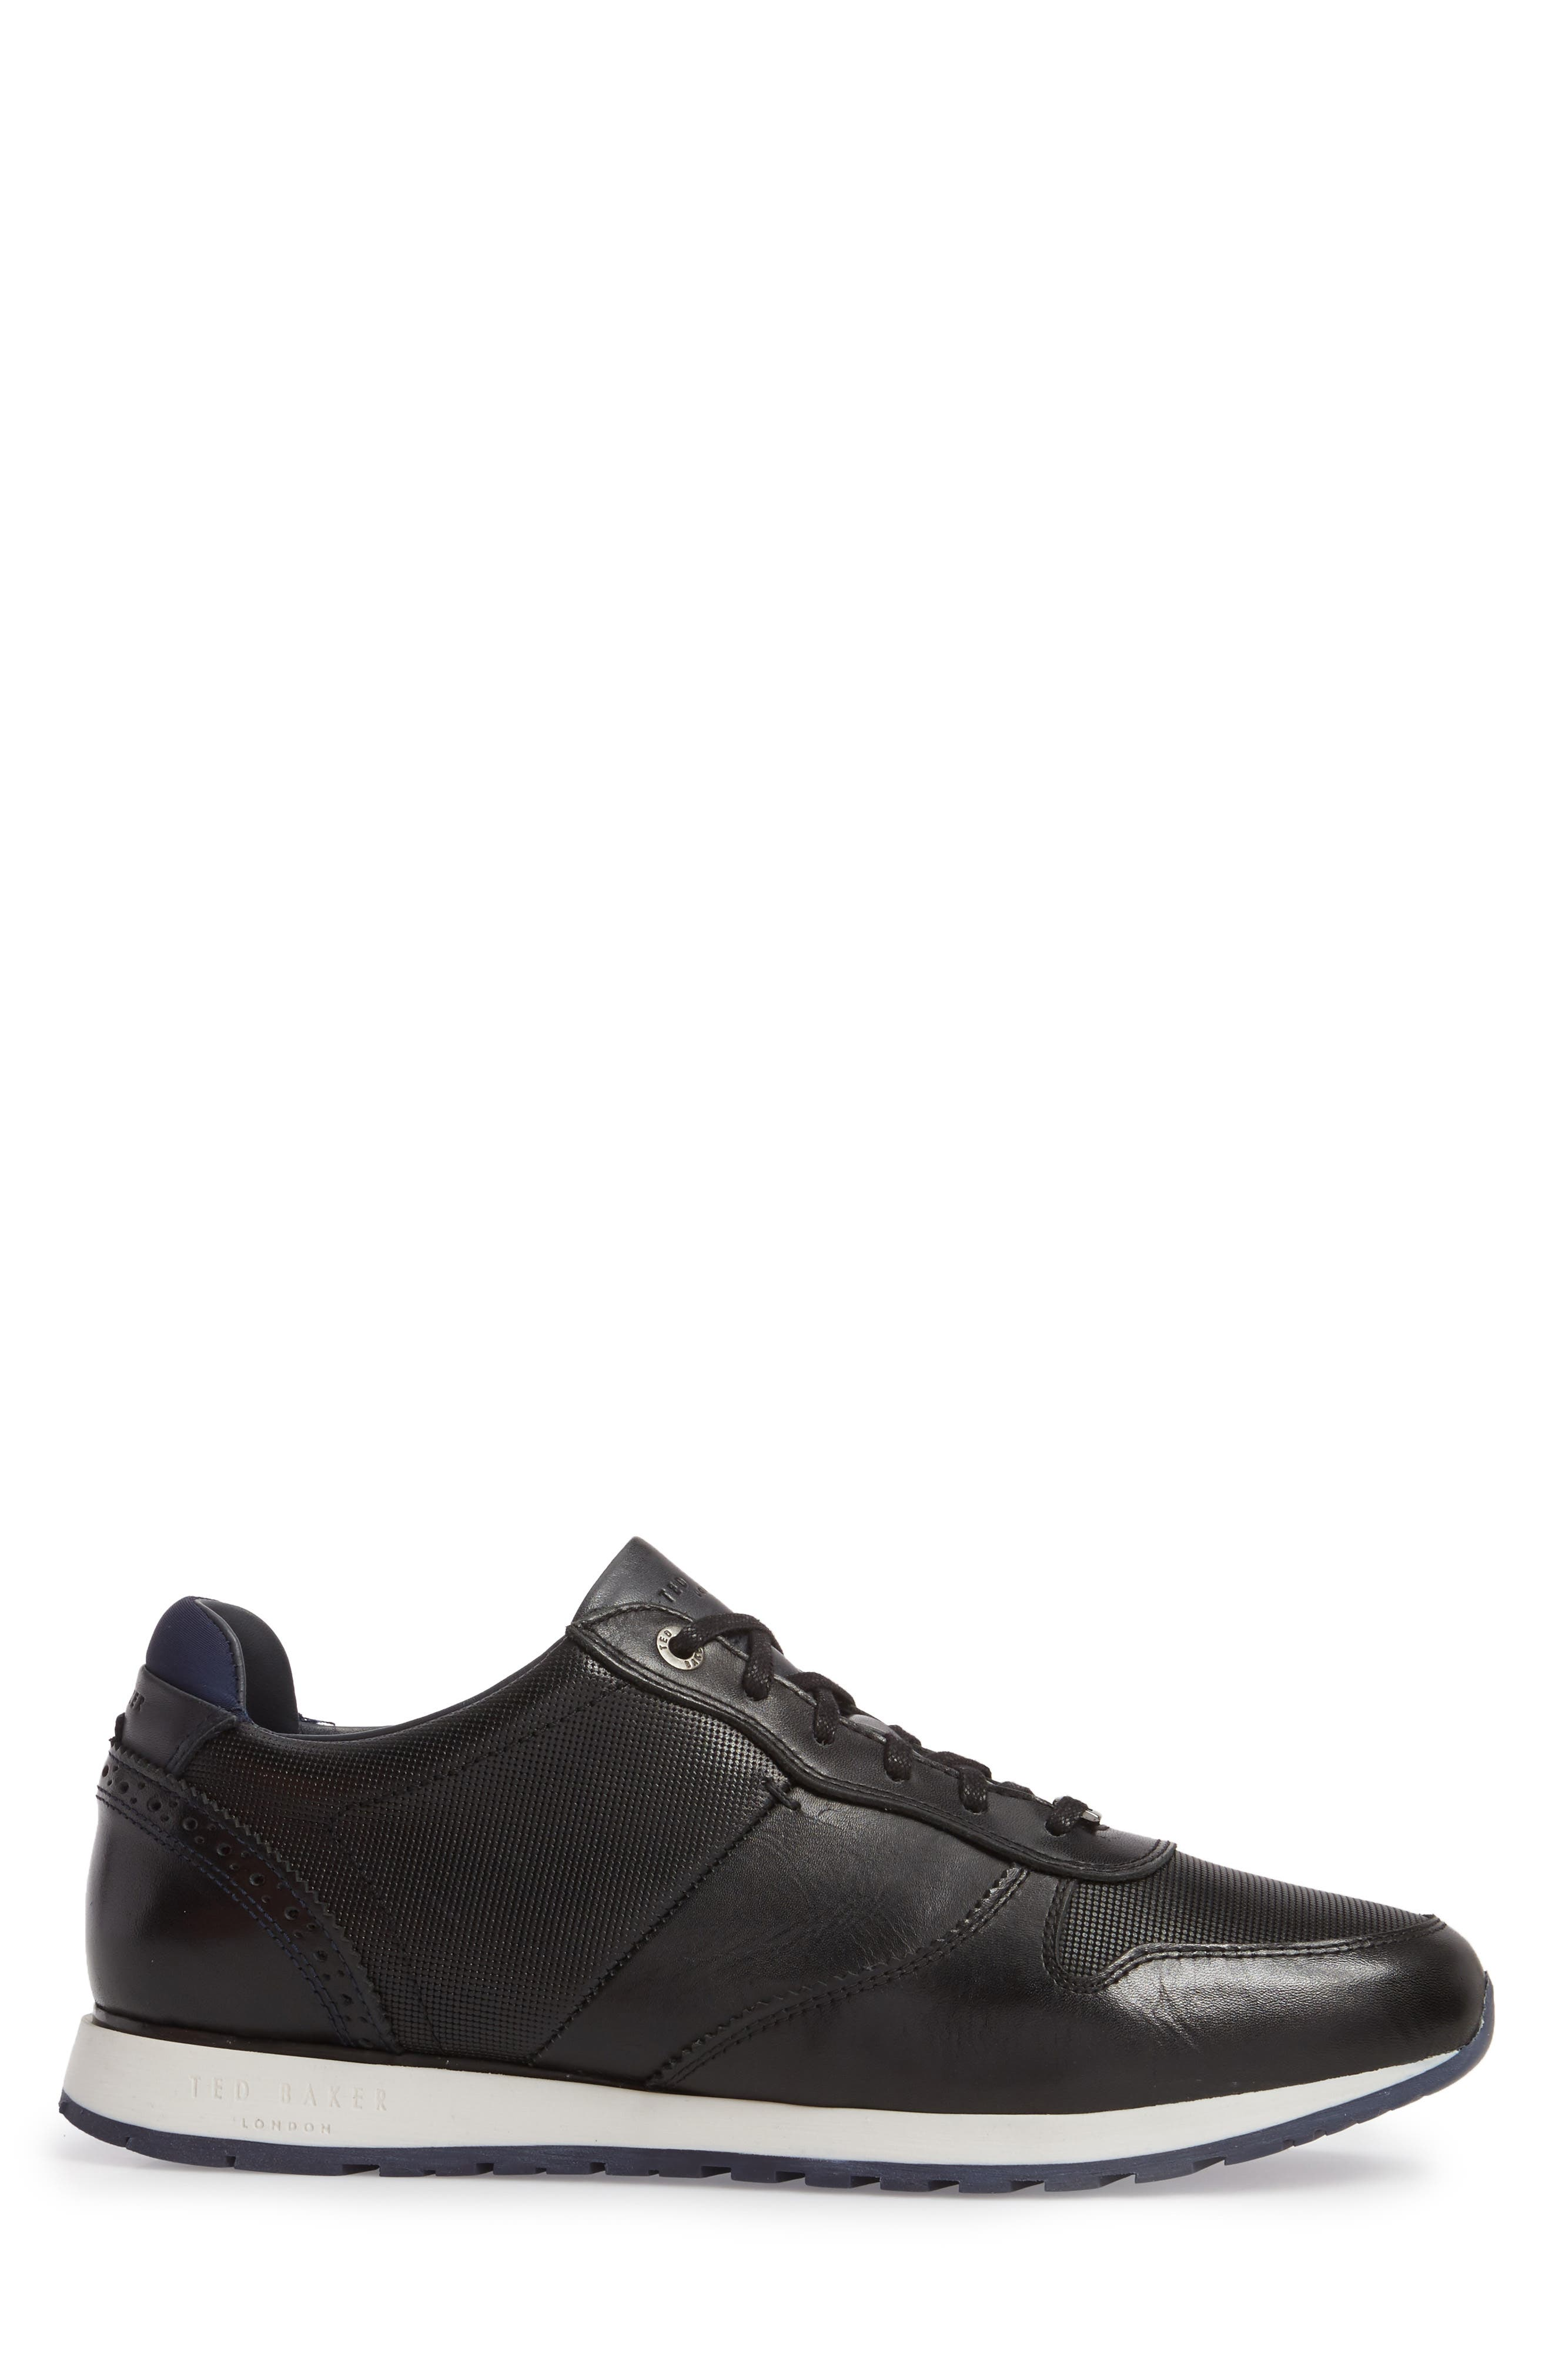 Shindl Sneaker,                             Alternate thumbnail 3, color,                             001